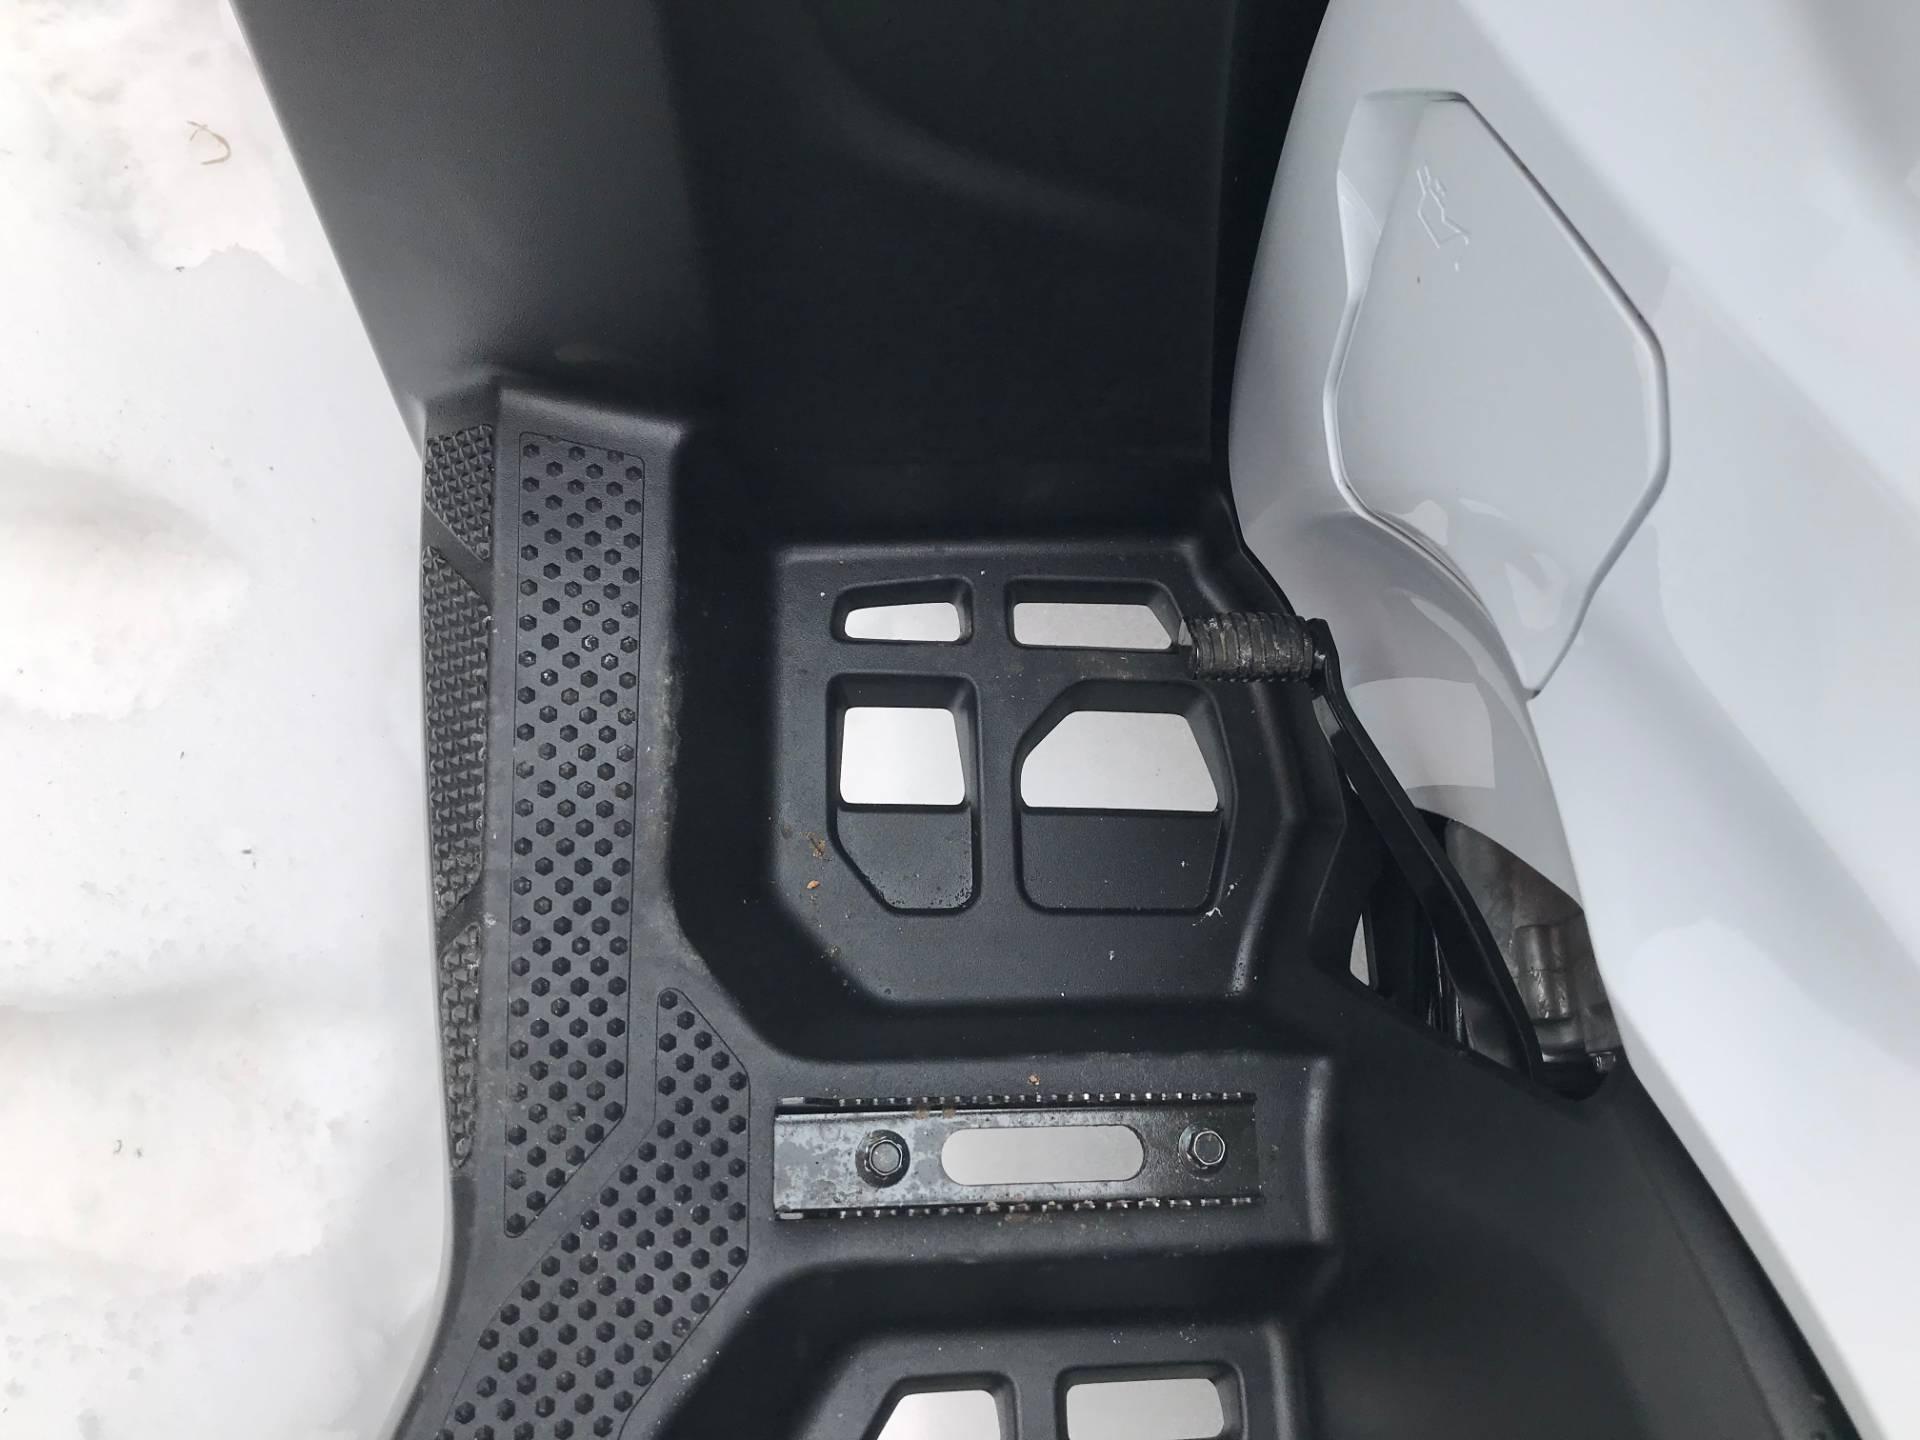 2017 Honda FourTrax Foreman 4x4 8